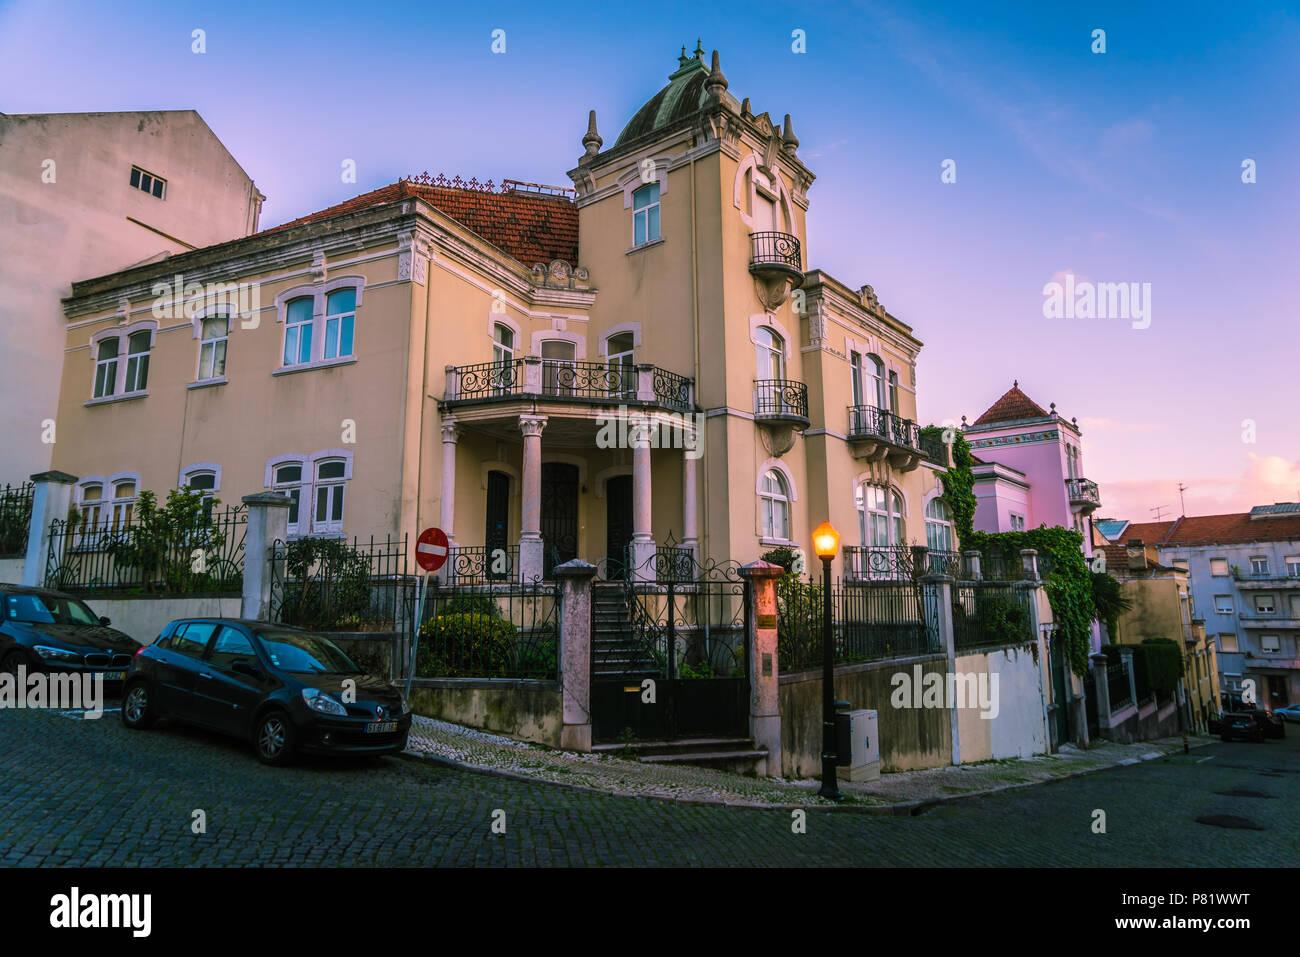 Lissabon, Portugal, Villa in der Lapa Bereich Stockbild